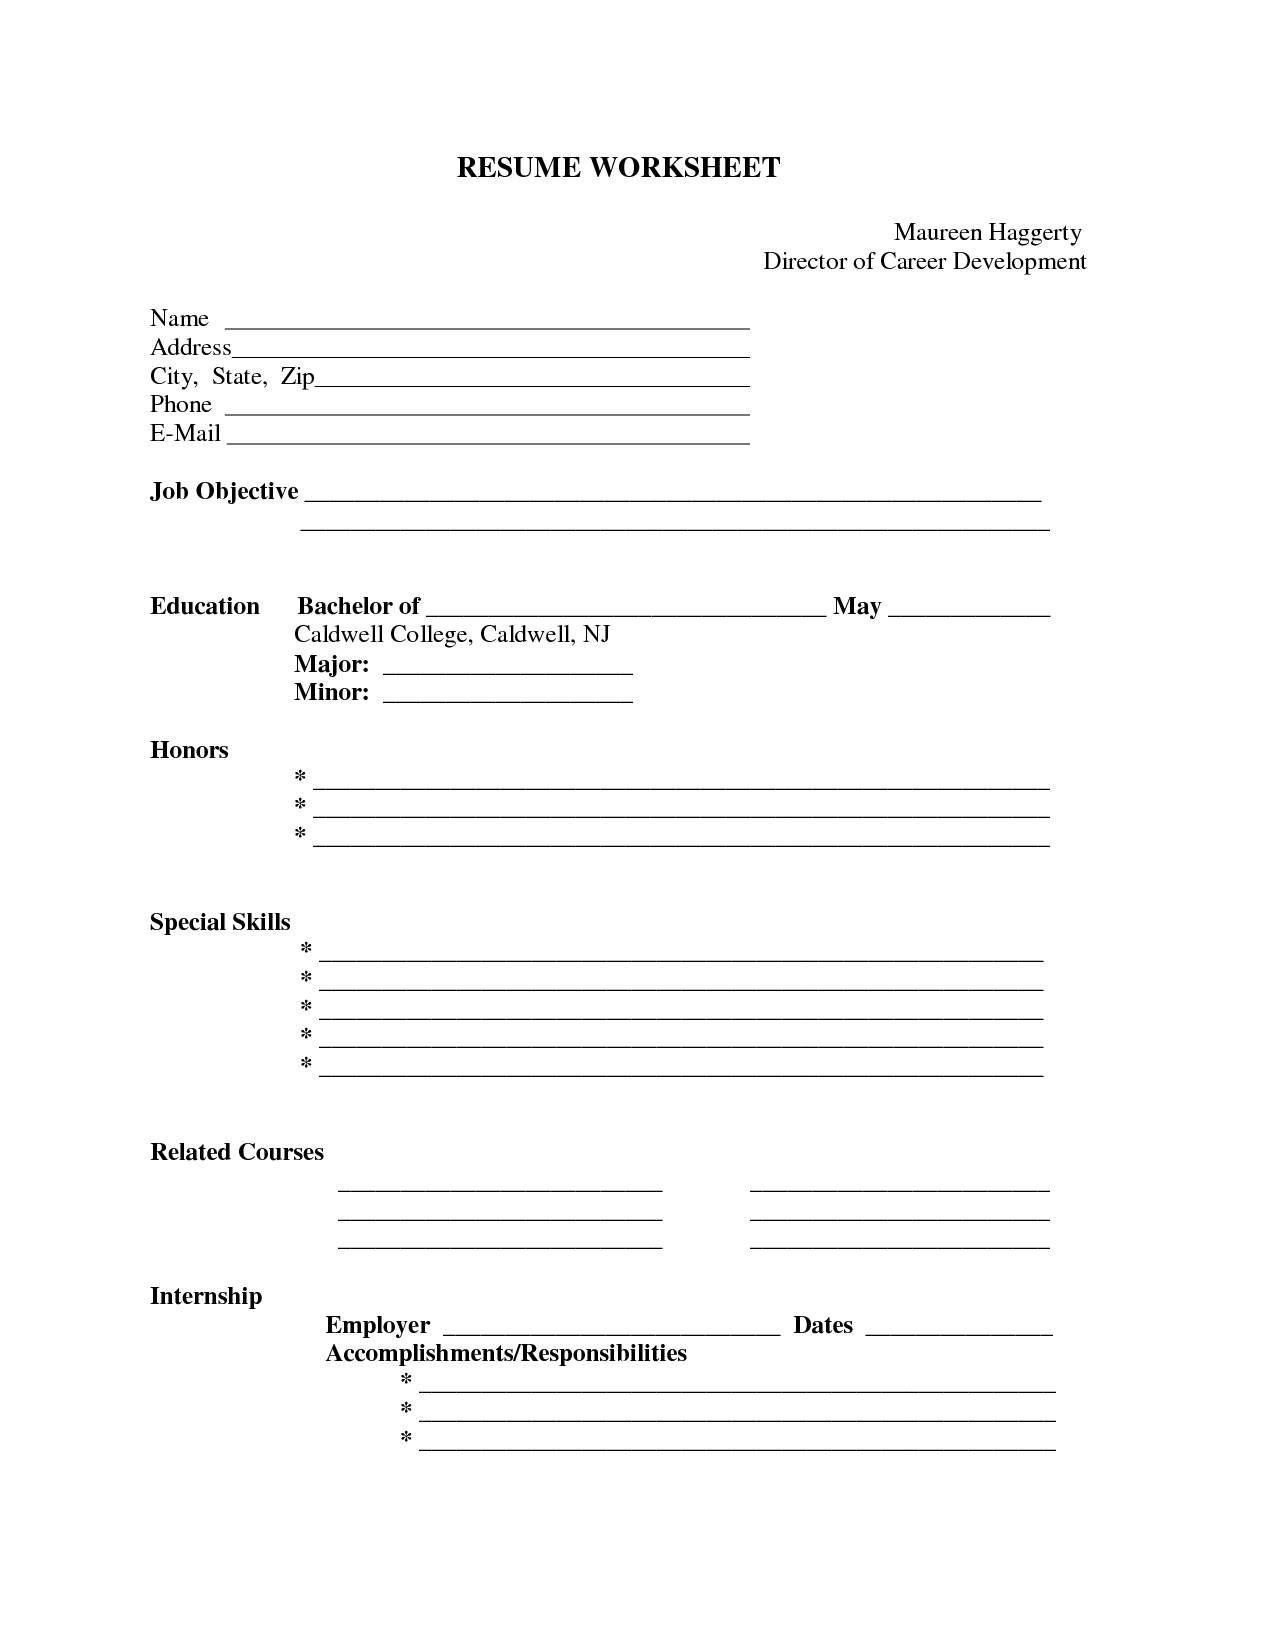 Resume Empty Form Resume Sample